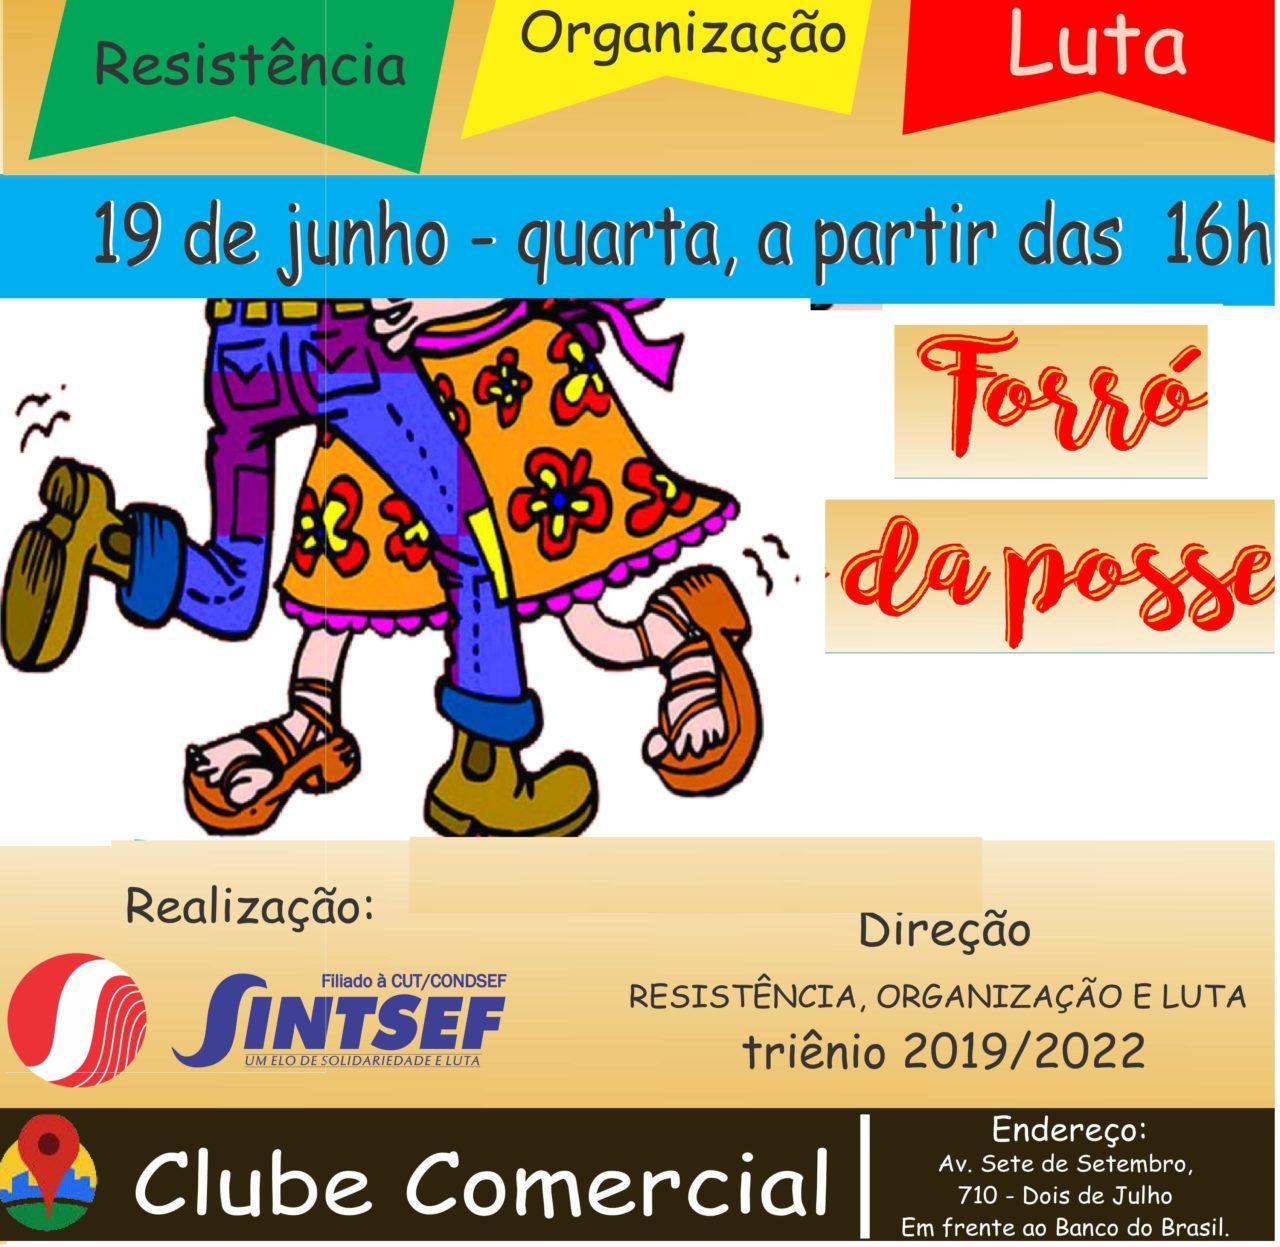 Forró-da-posse-min-1280x1247.jpg